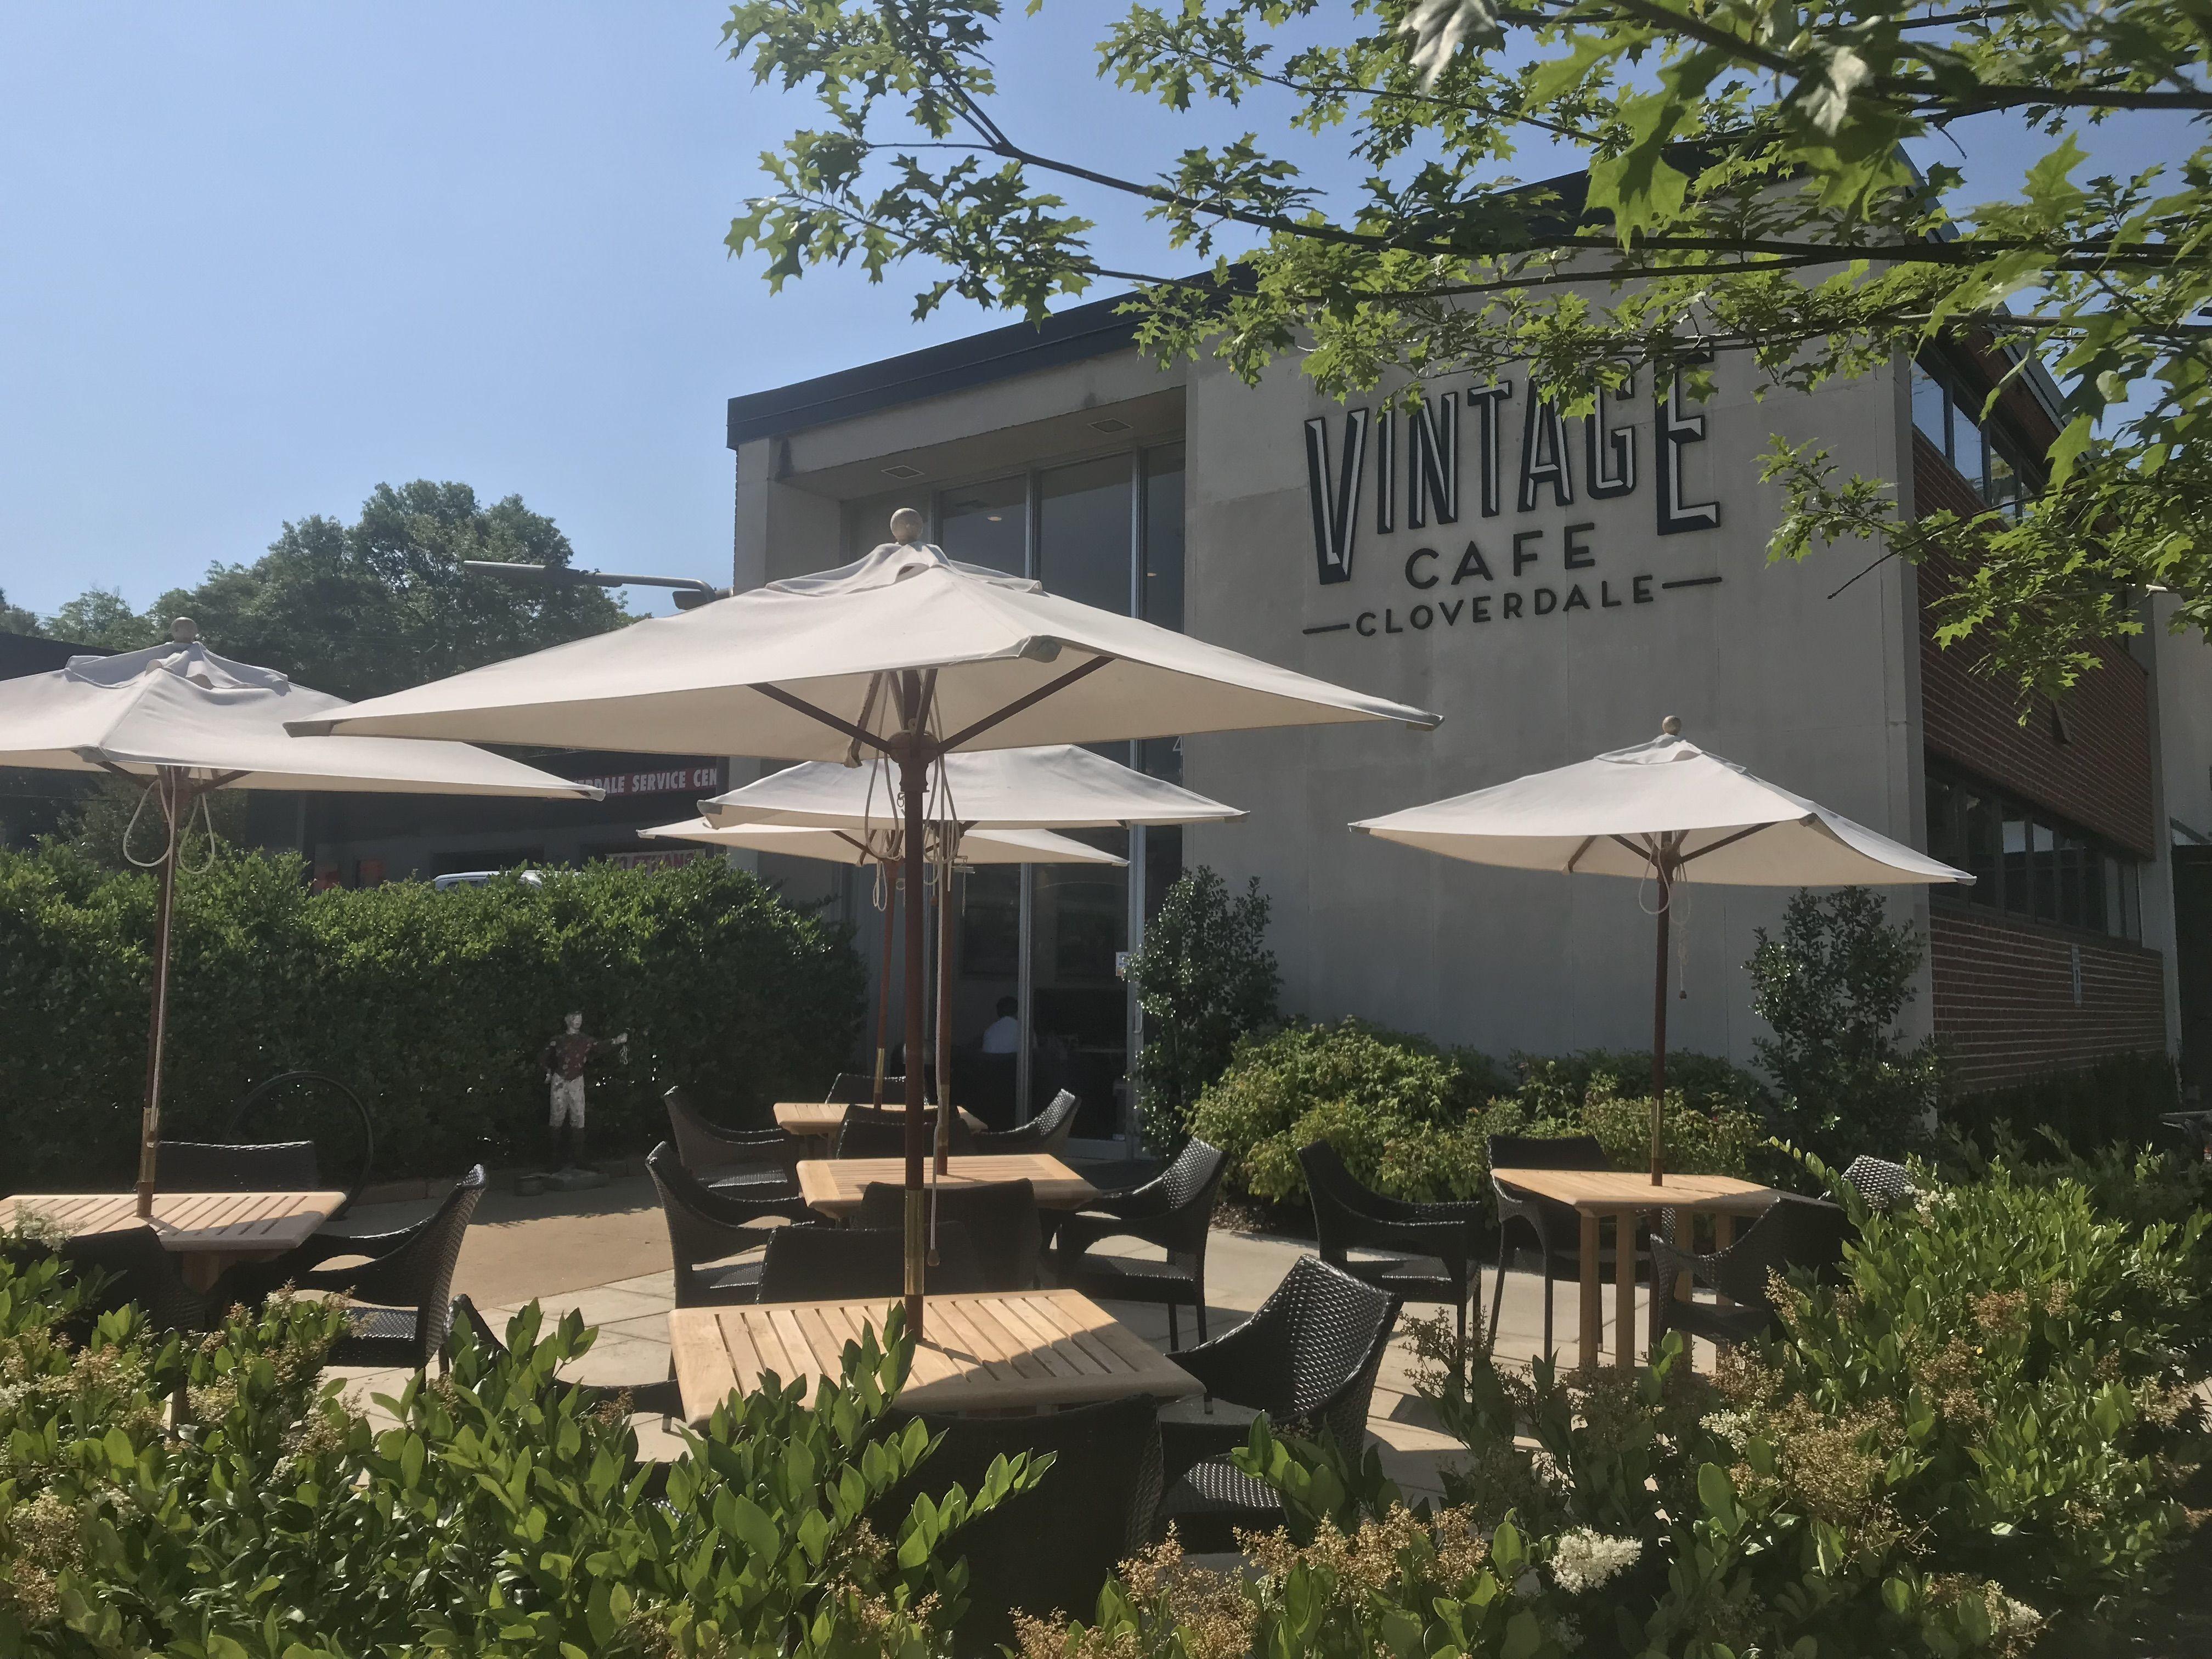 Vintage Cafe Celebrates One Year Anniversary Vintage Cafe One Year Anniversary Cafe